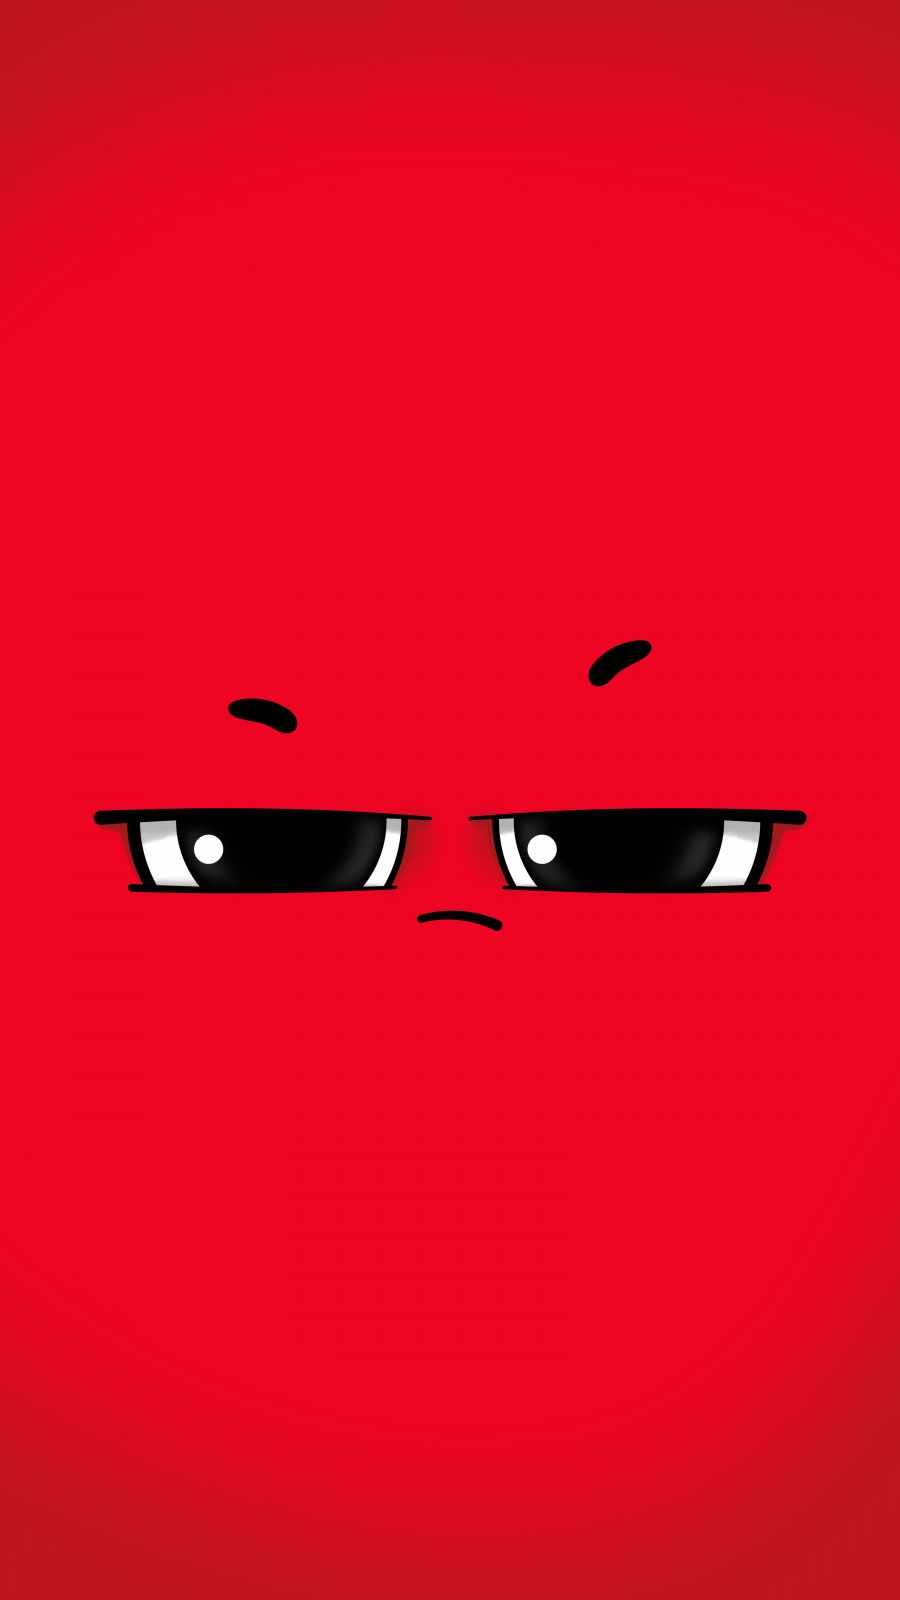 Rude Face iPhone Wallpaper